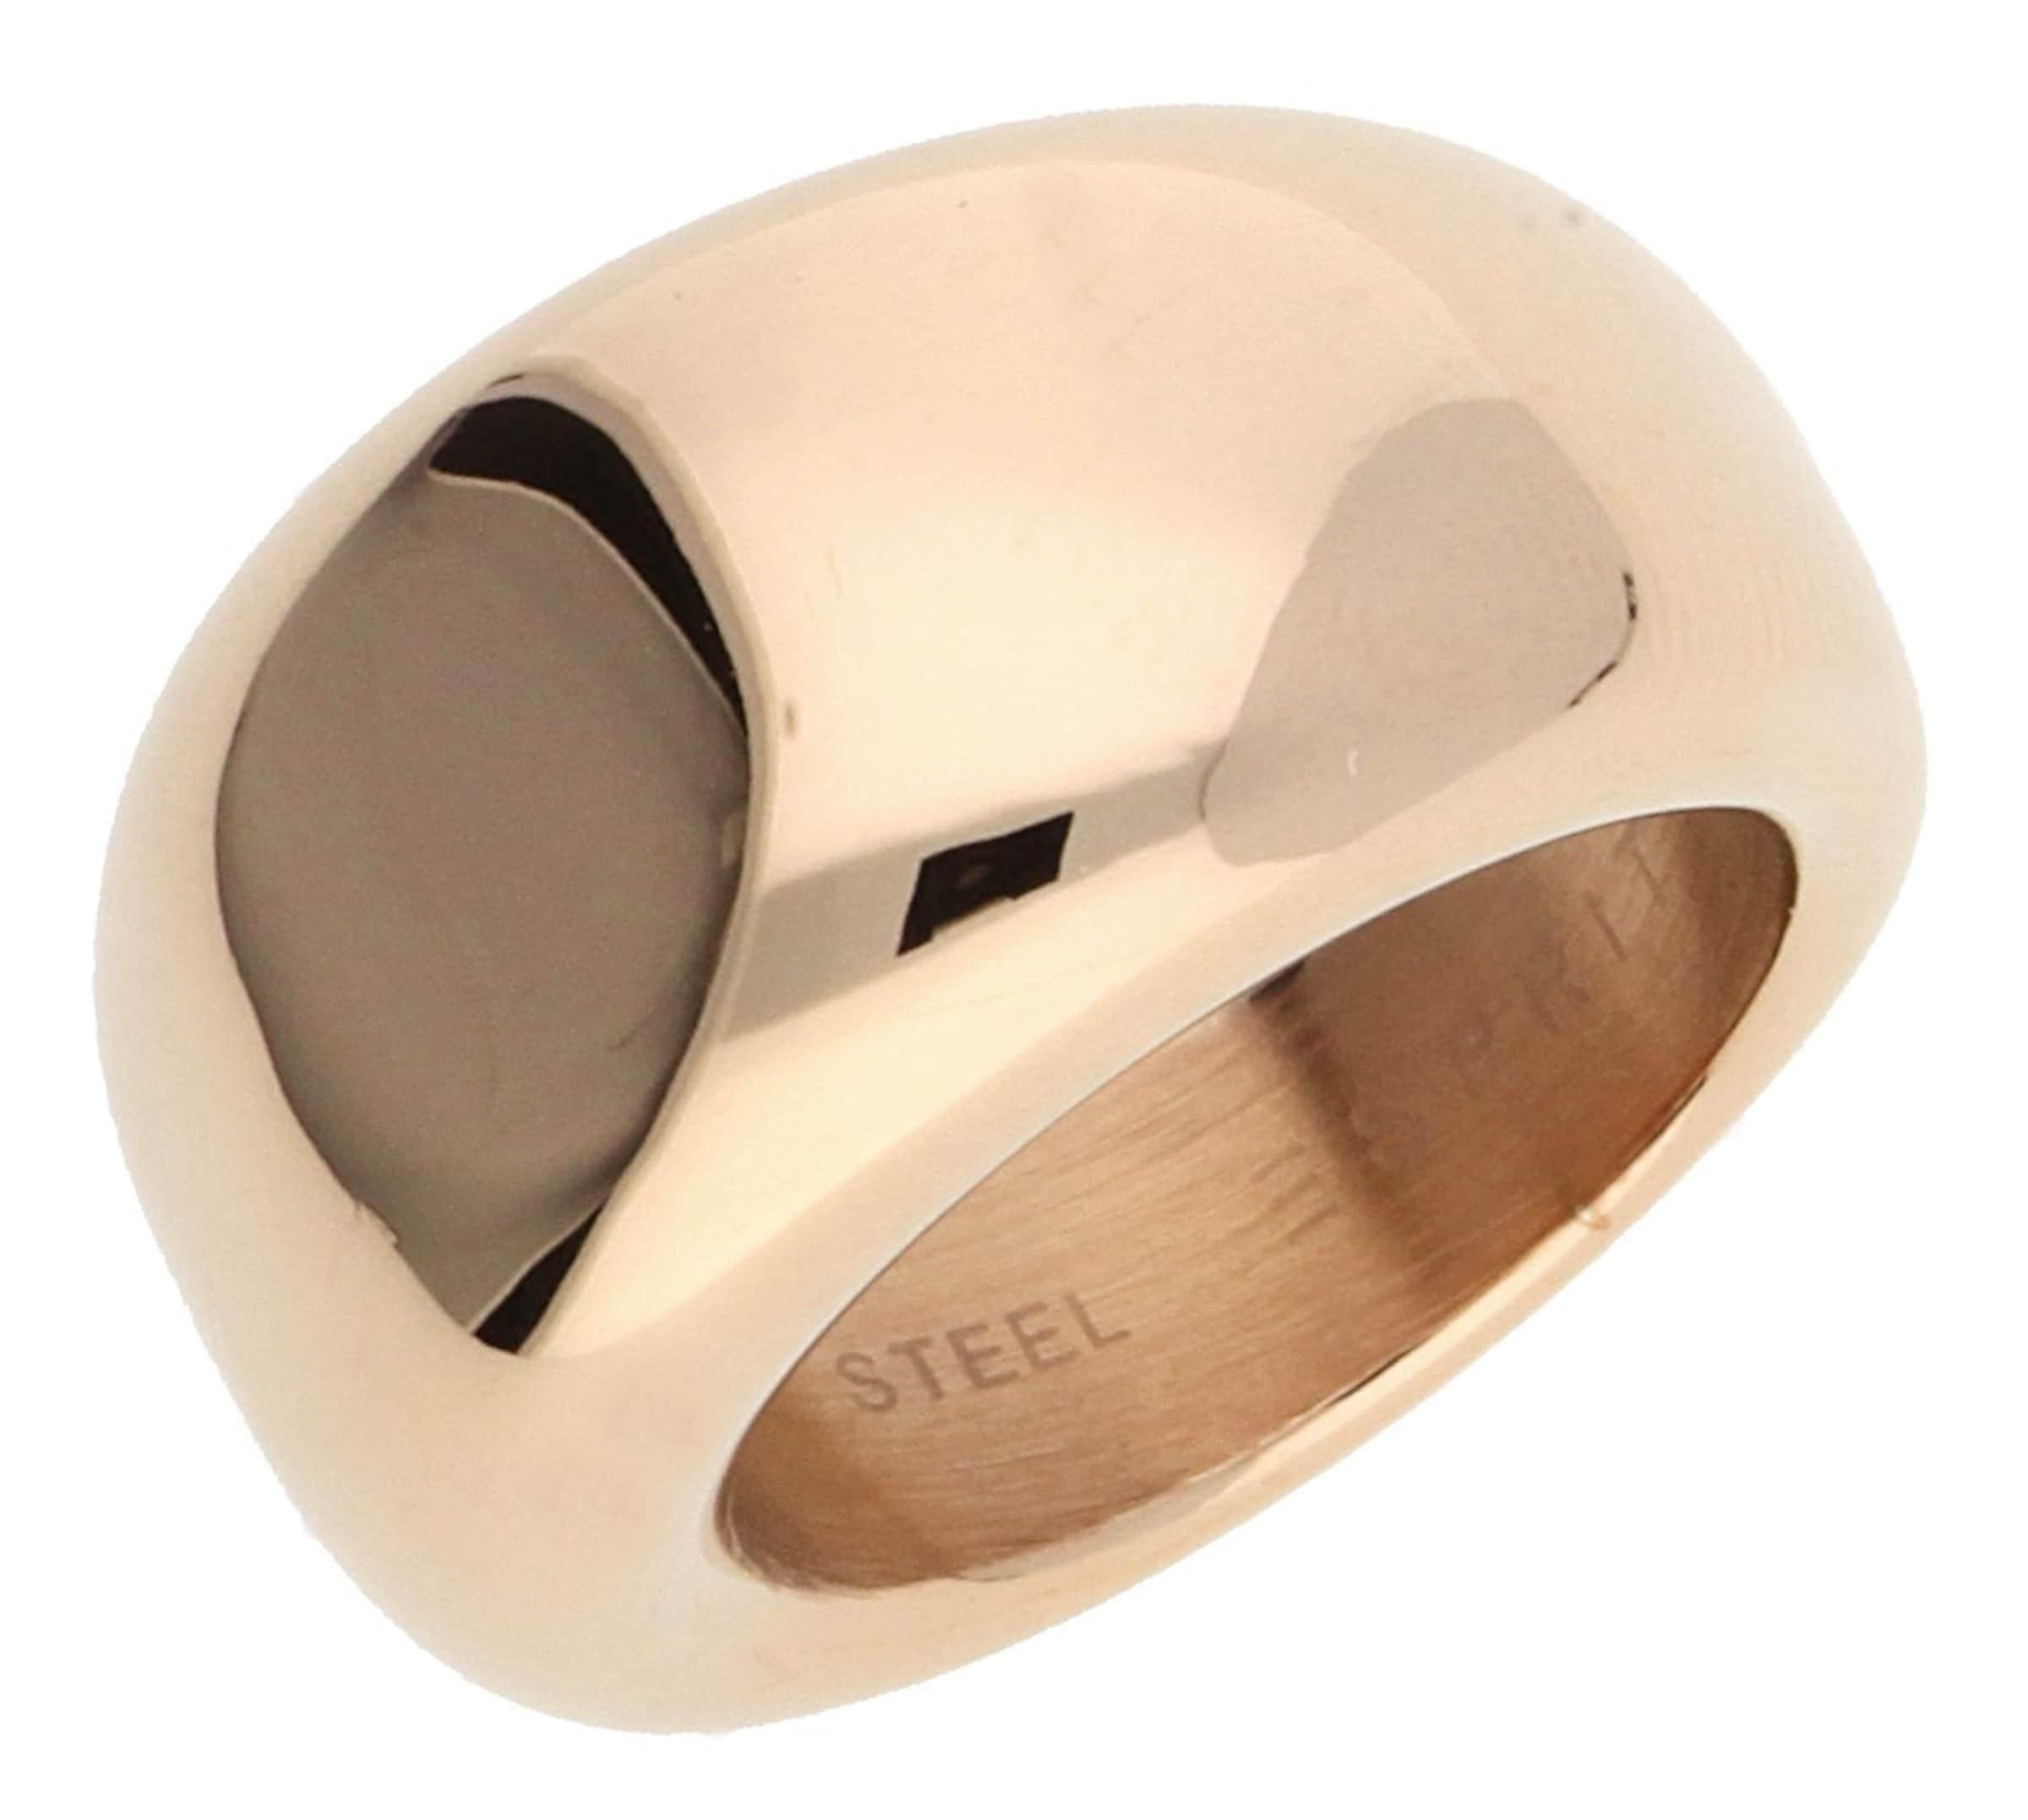 ESPRIT Damen Fingerring Rosegold Bold ESRG12426C Günstig Kaufen Billig HSO8Tvu